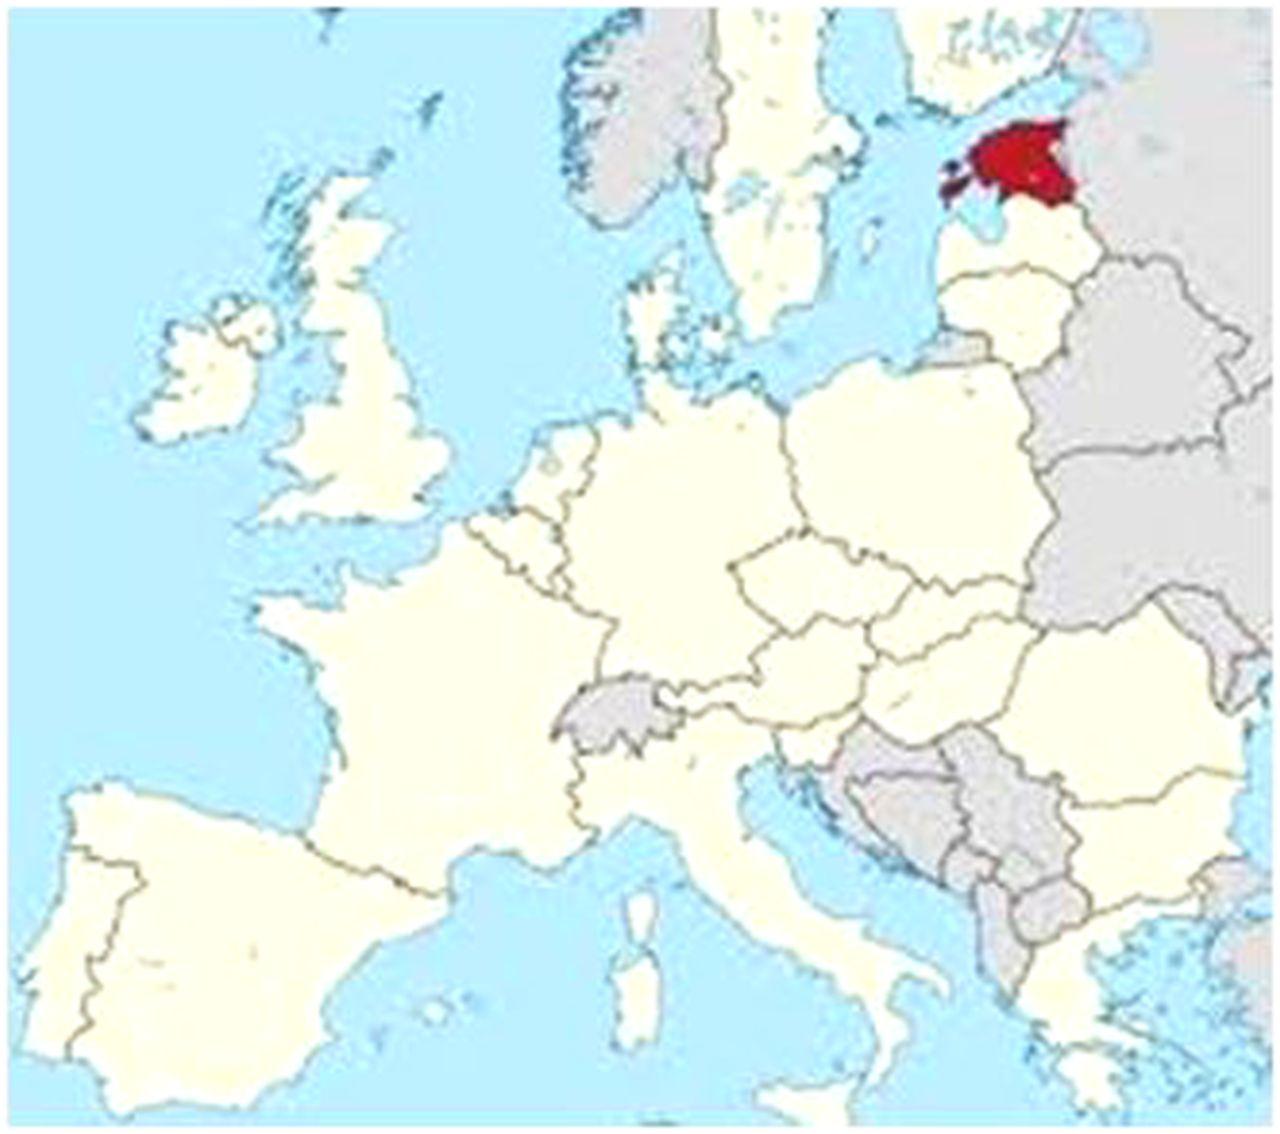 Estonia Practical Neurology - Estonia map download